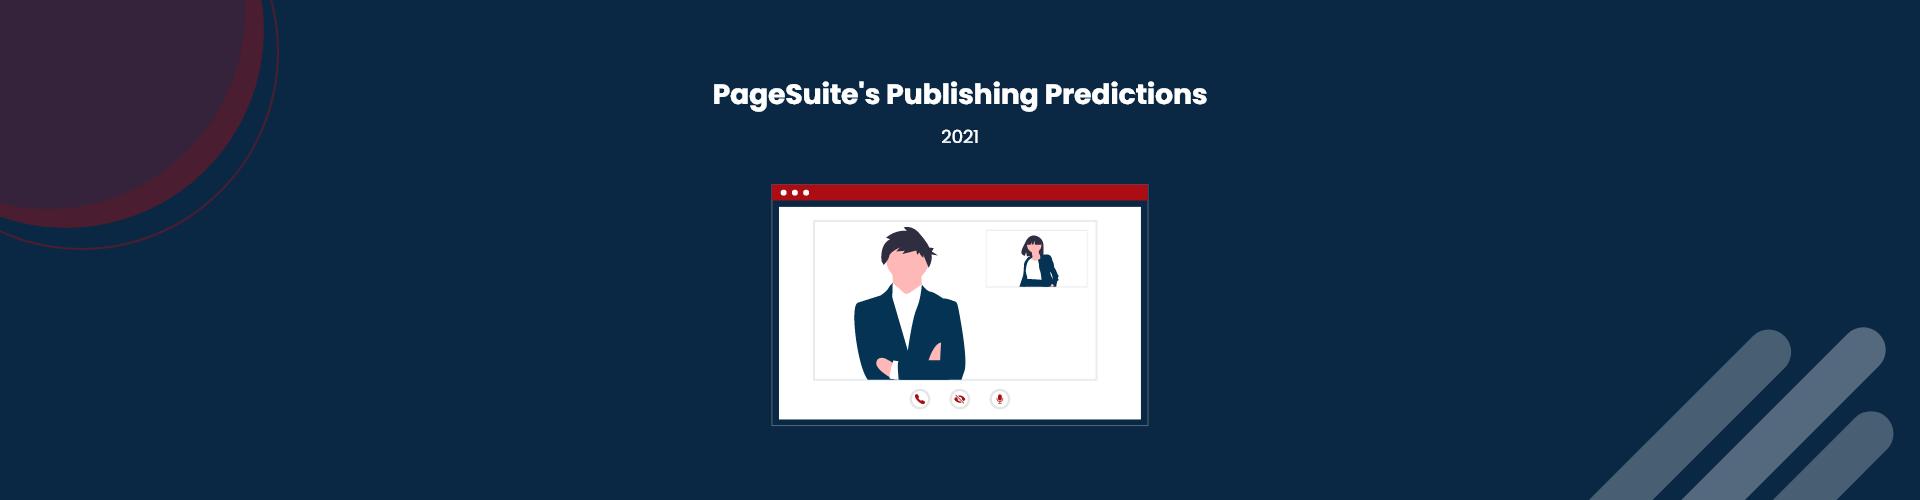 PageSuite's Publishing Predictions